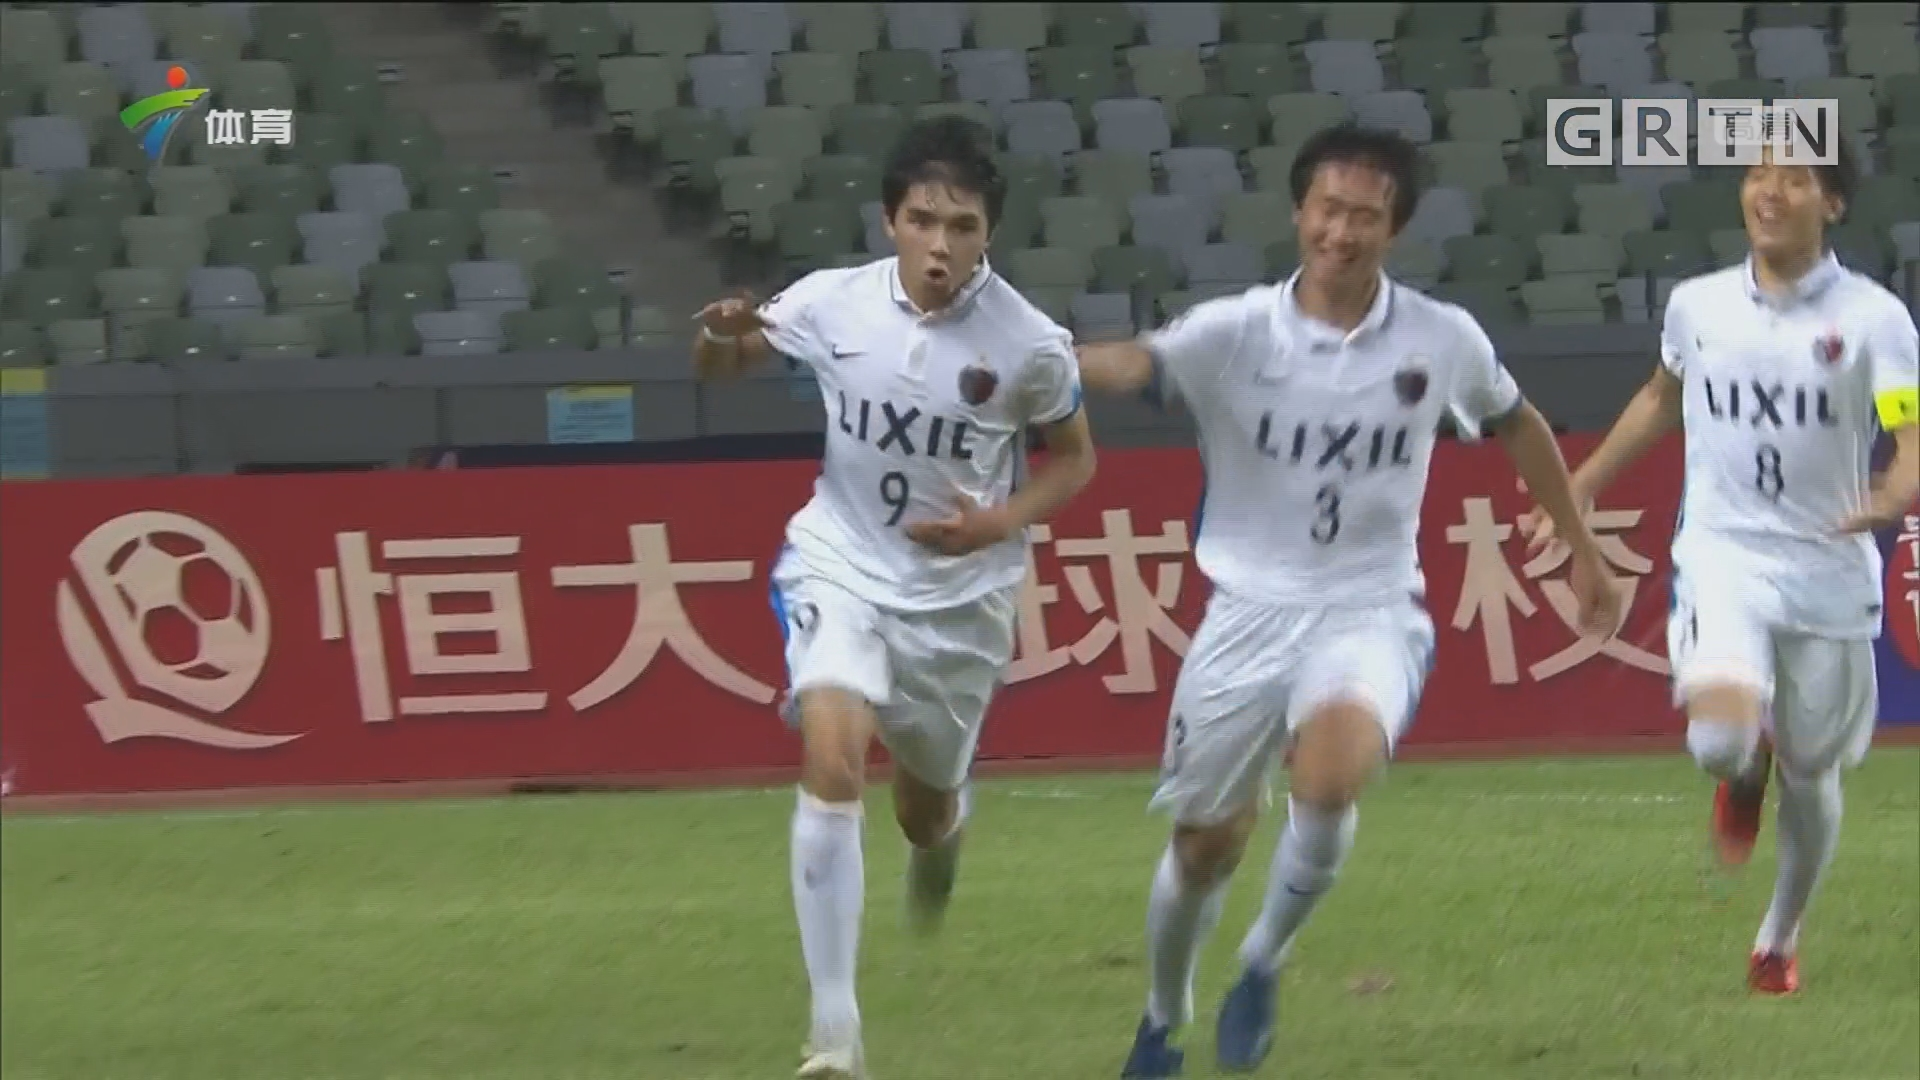 U17国际冠军赛 恒大夺金蝶组亚军